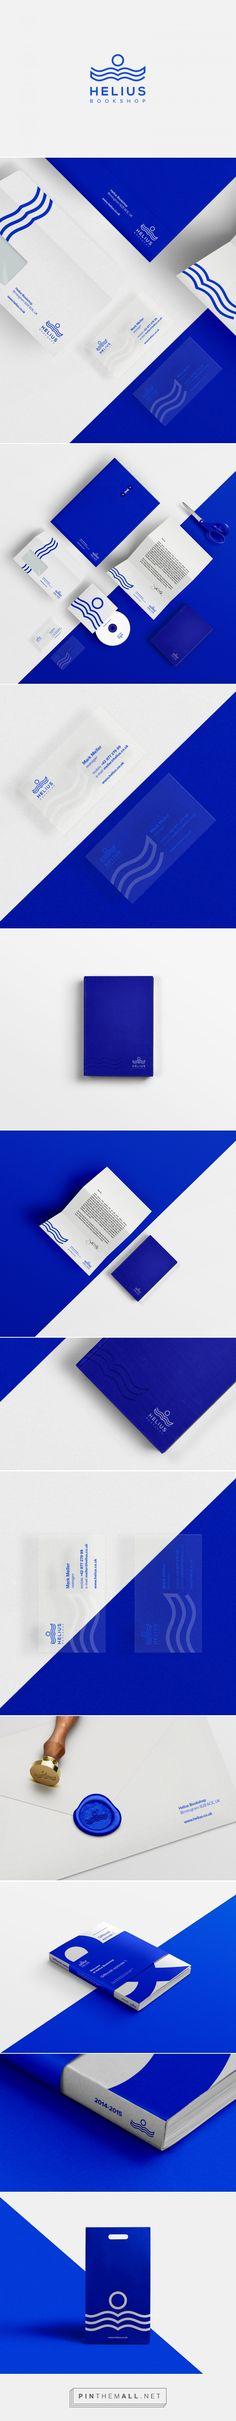 Helius bookshop Branding on Behance